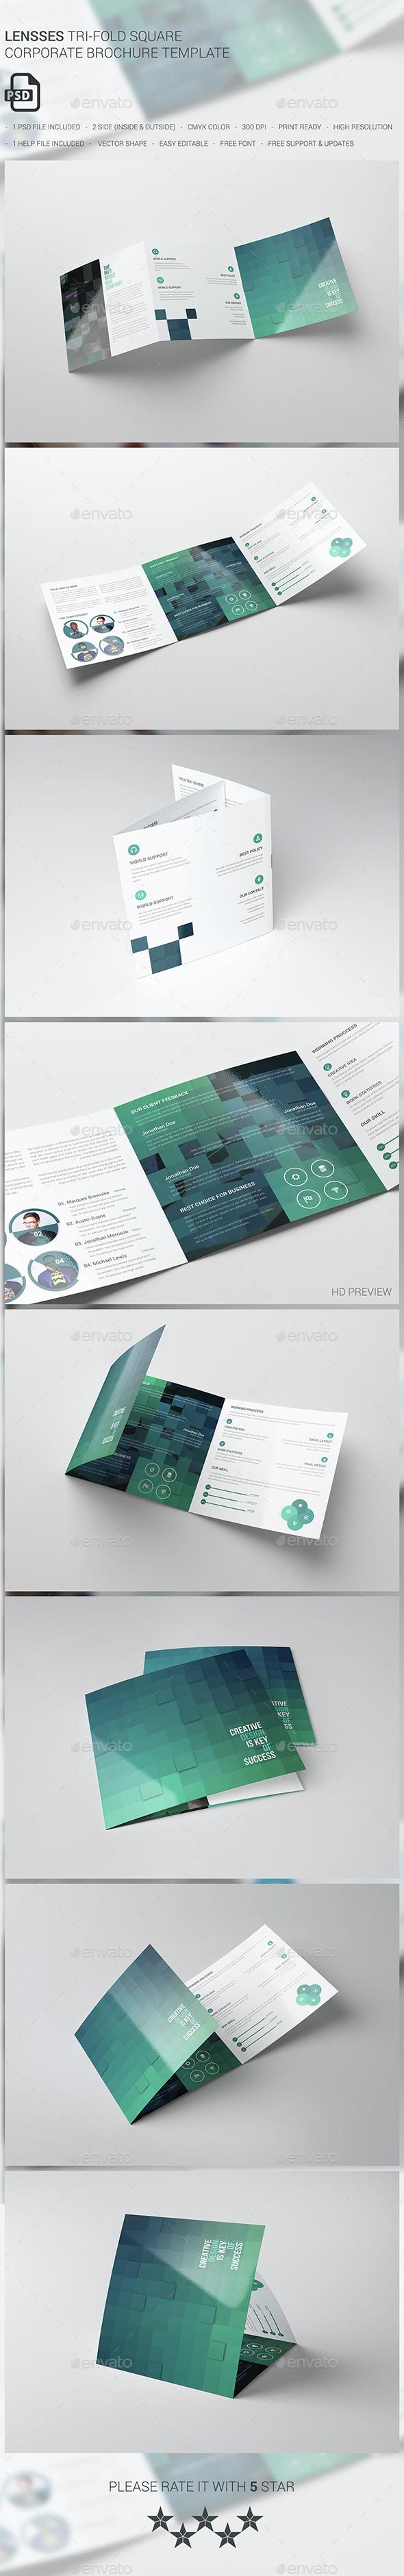 Sencrise Square Tri Fold Brochure Template By Evny Graphicriver